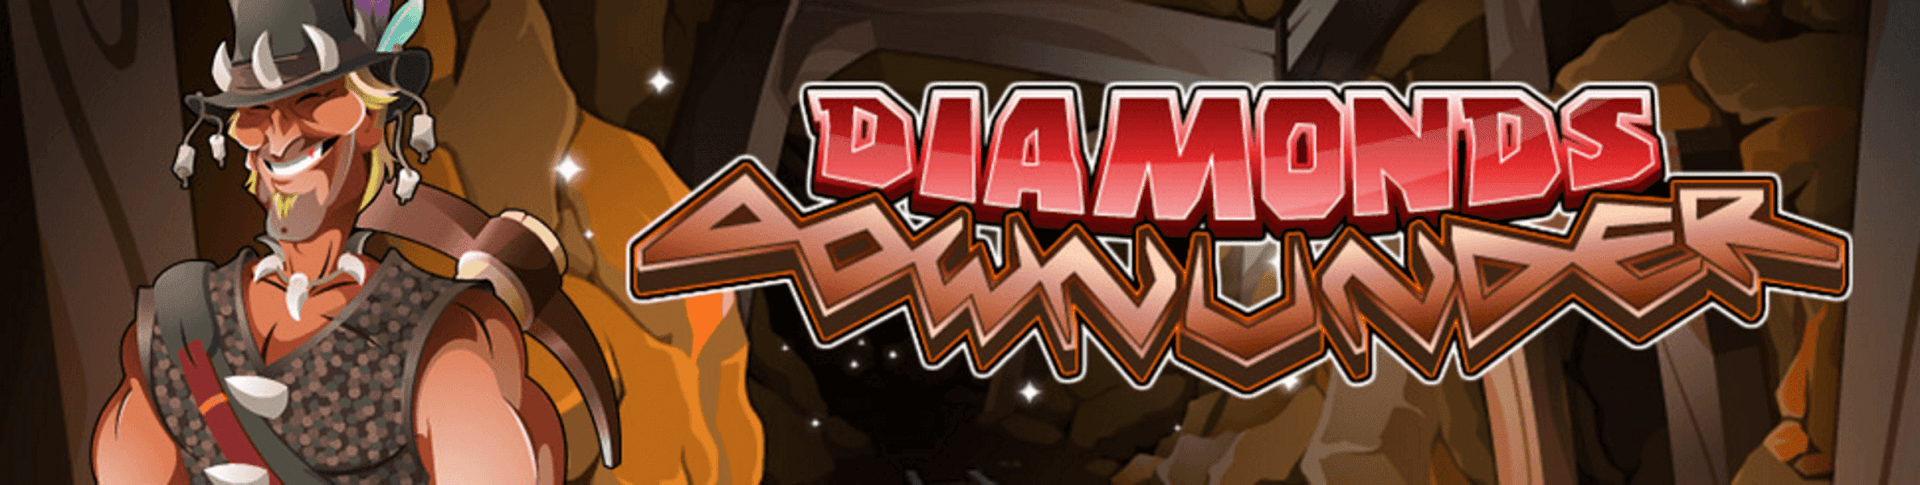 Diamonds Downunder slot